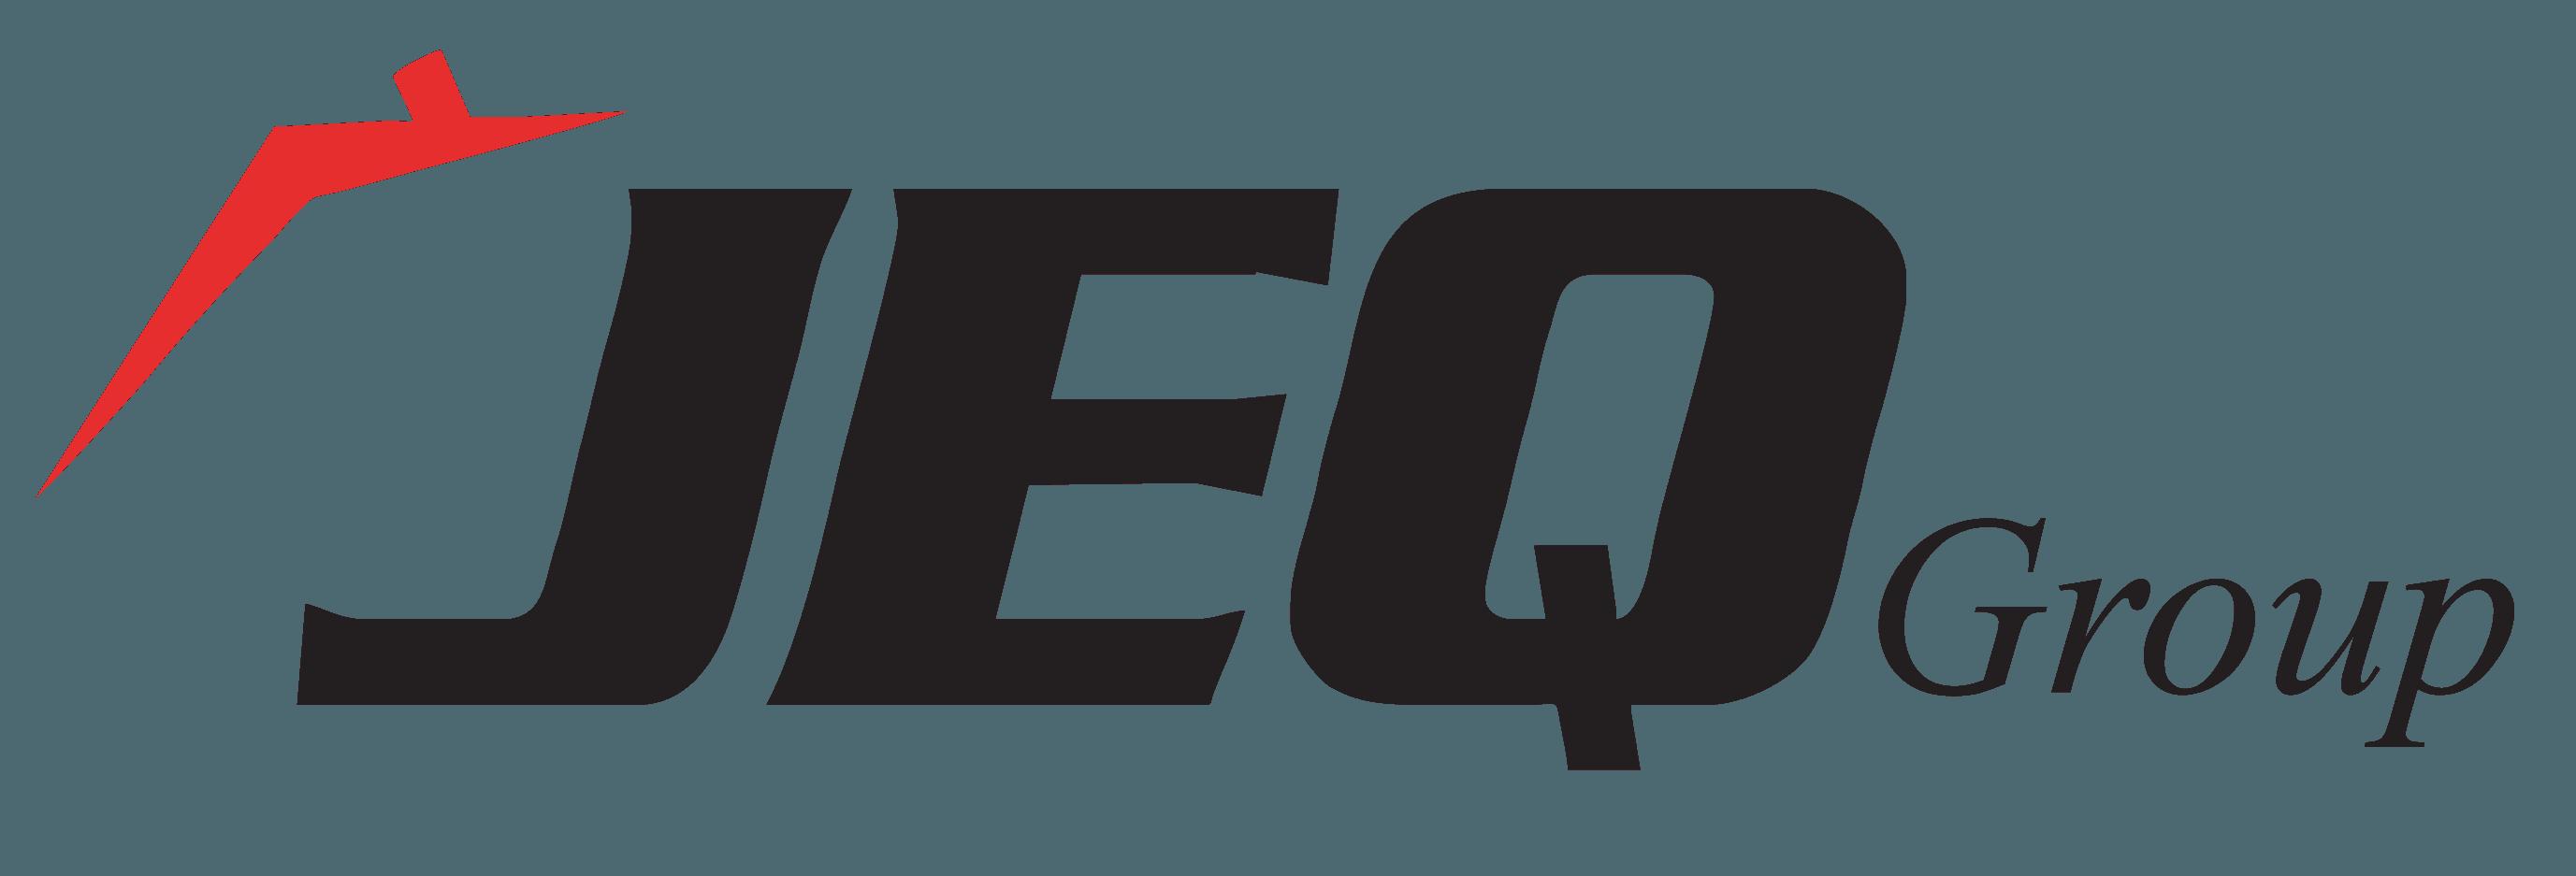 JEQ Group